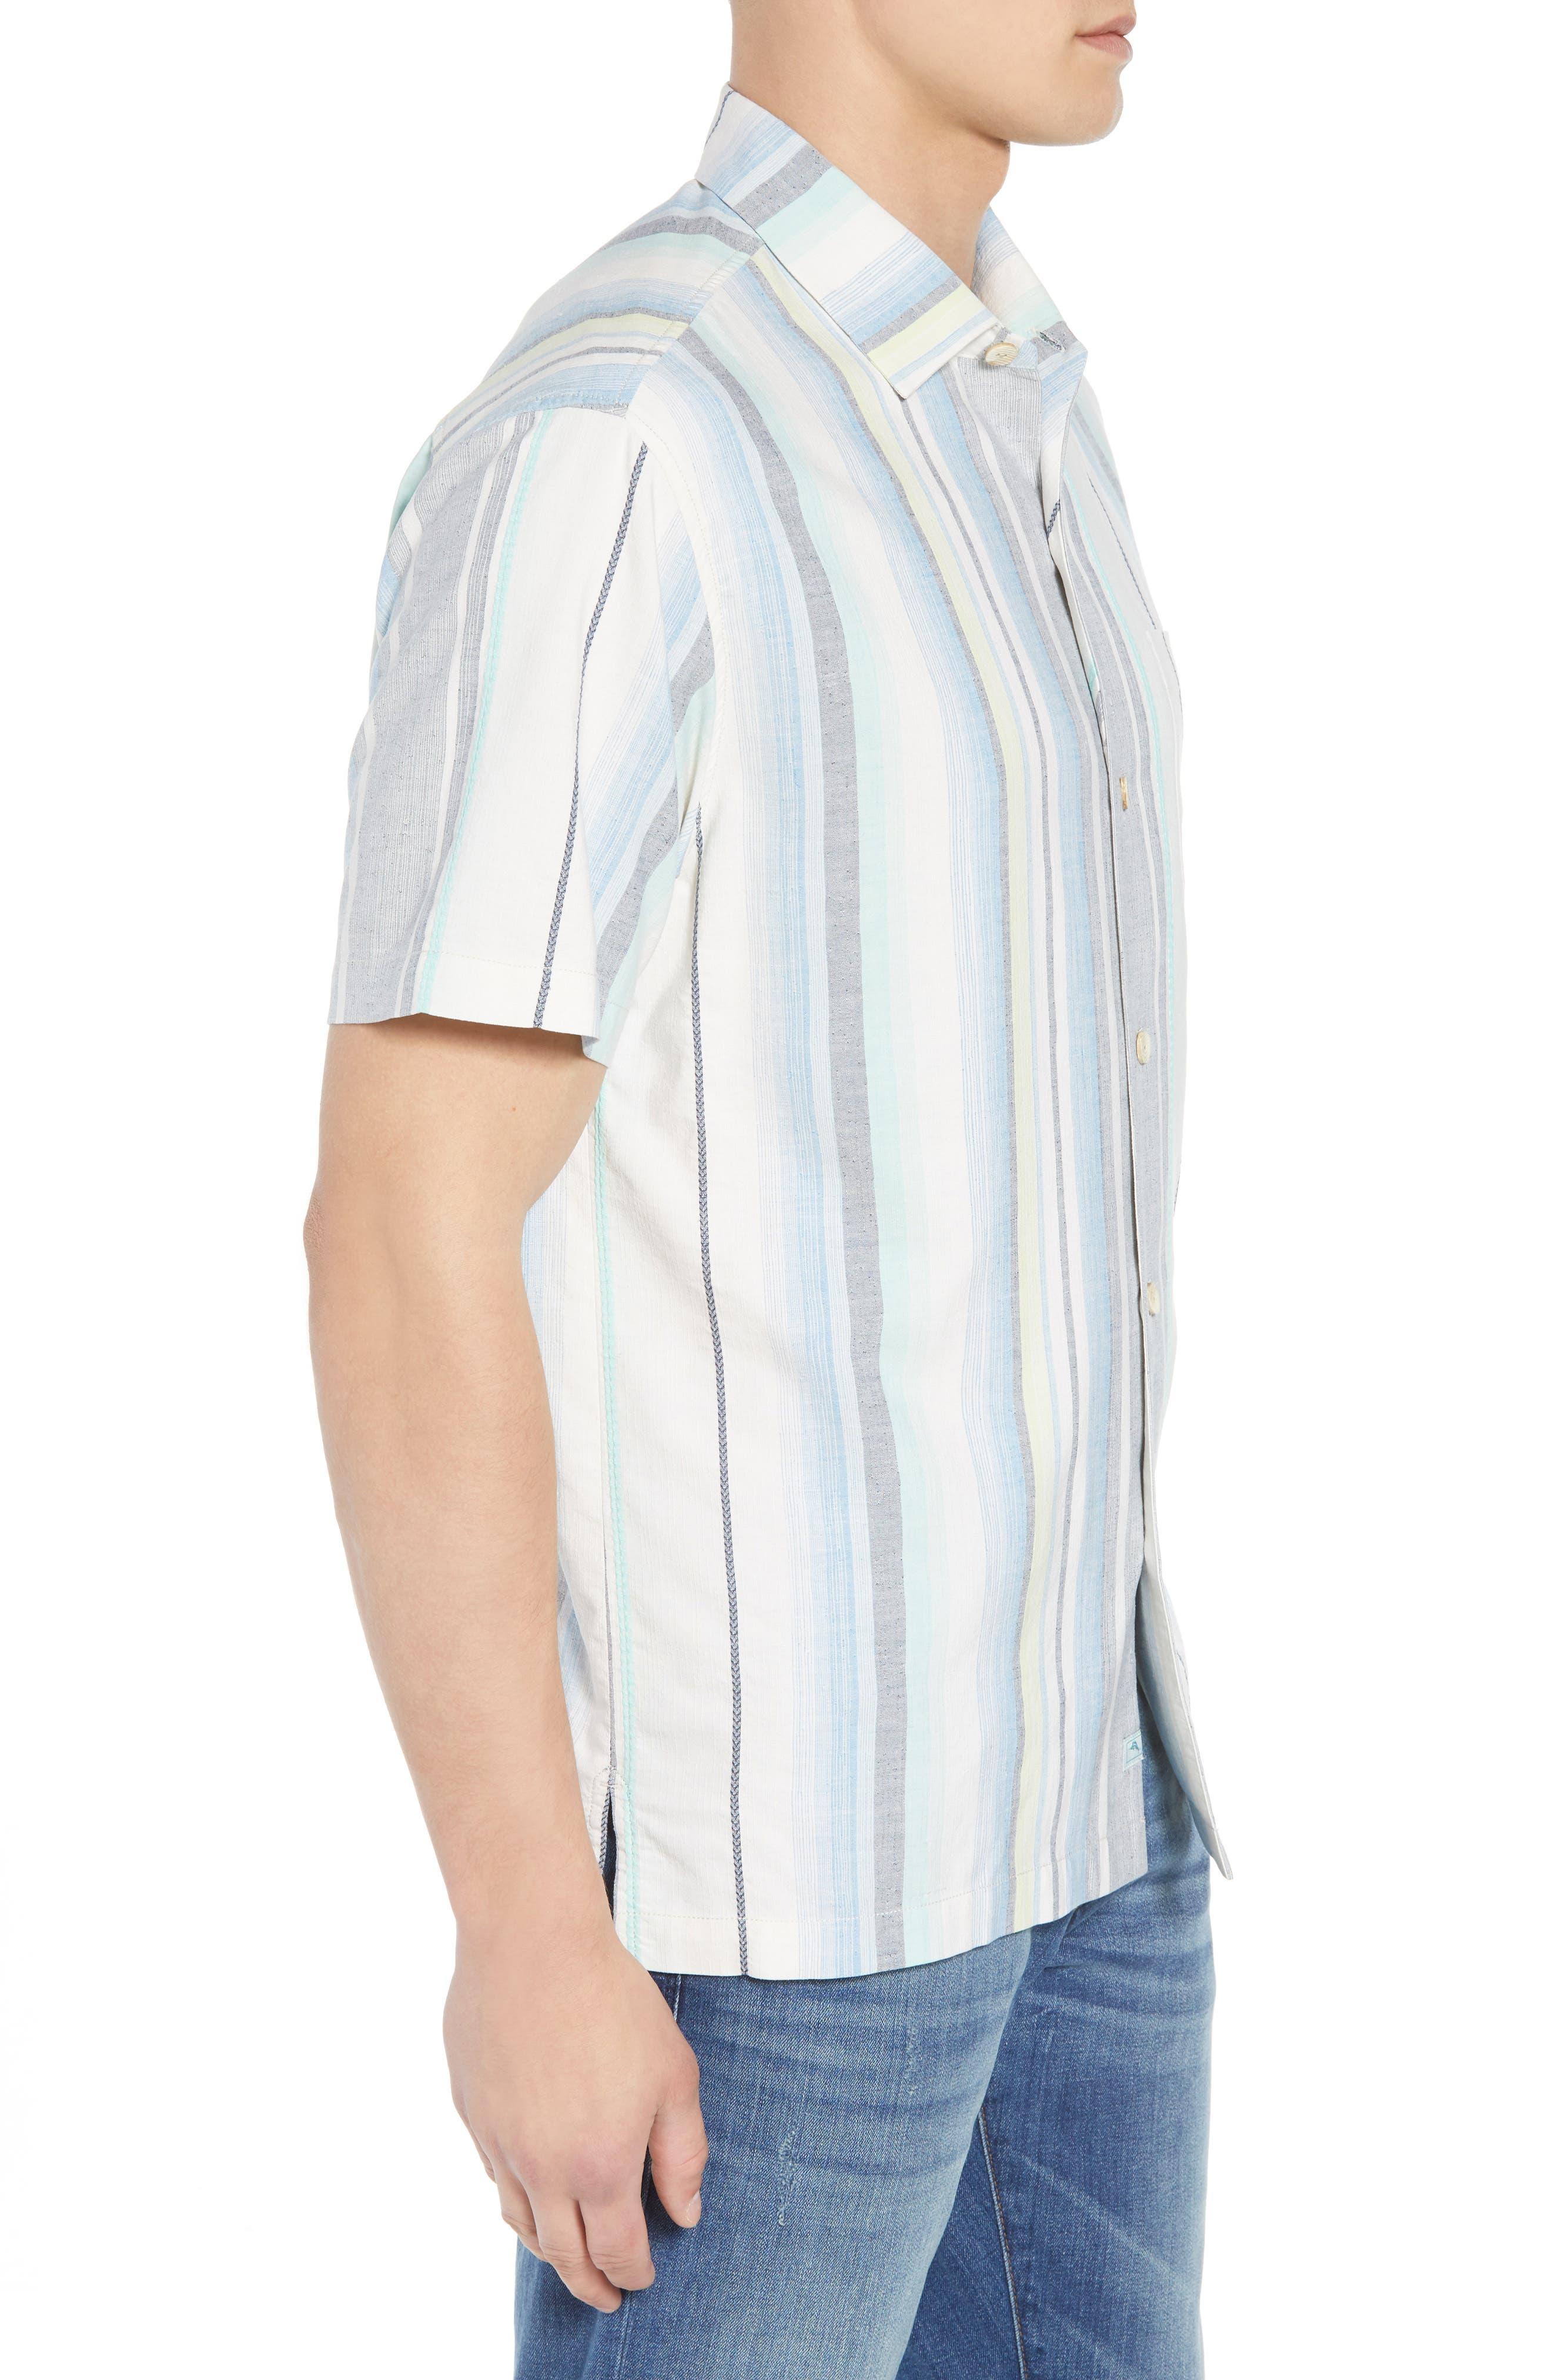 Posado Sands Silk Camp Shirt,                             Alternate thumbnail 4, color,                             Blue Aster